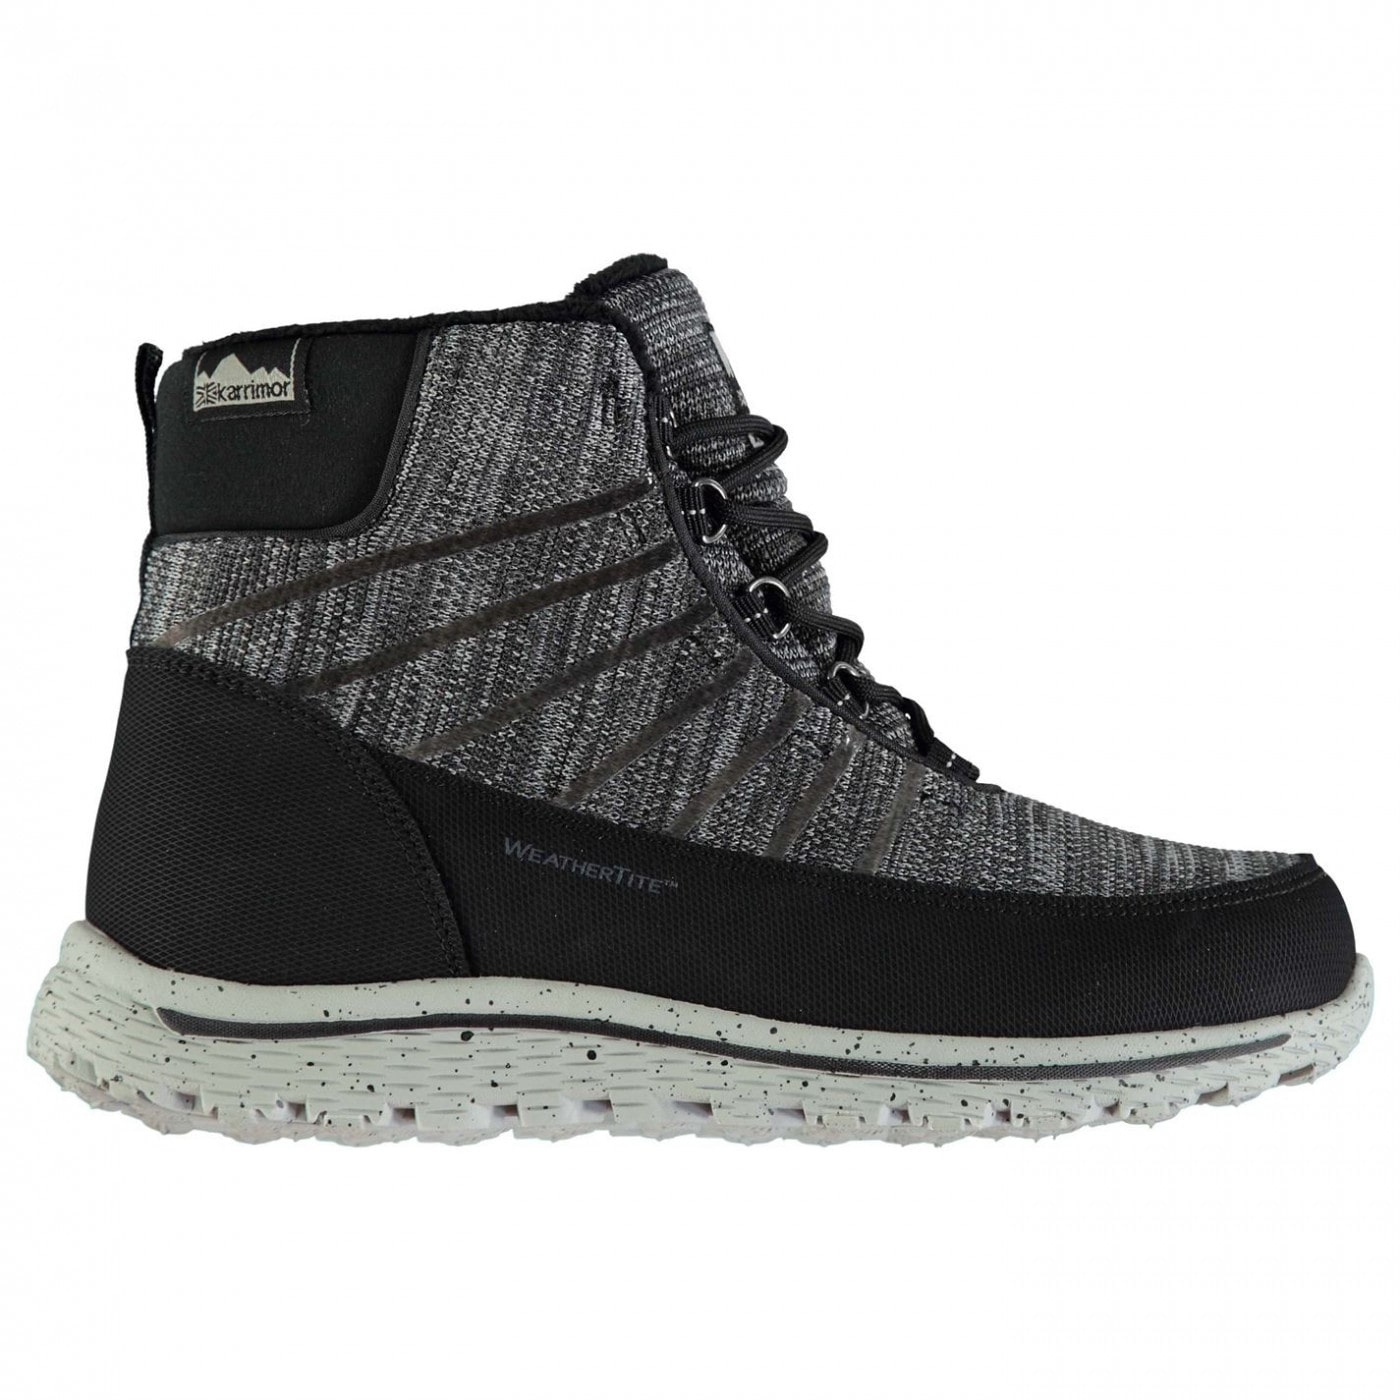 7c74751c0aee Téli cipők - FACTCOOL